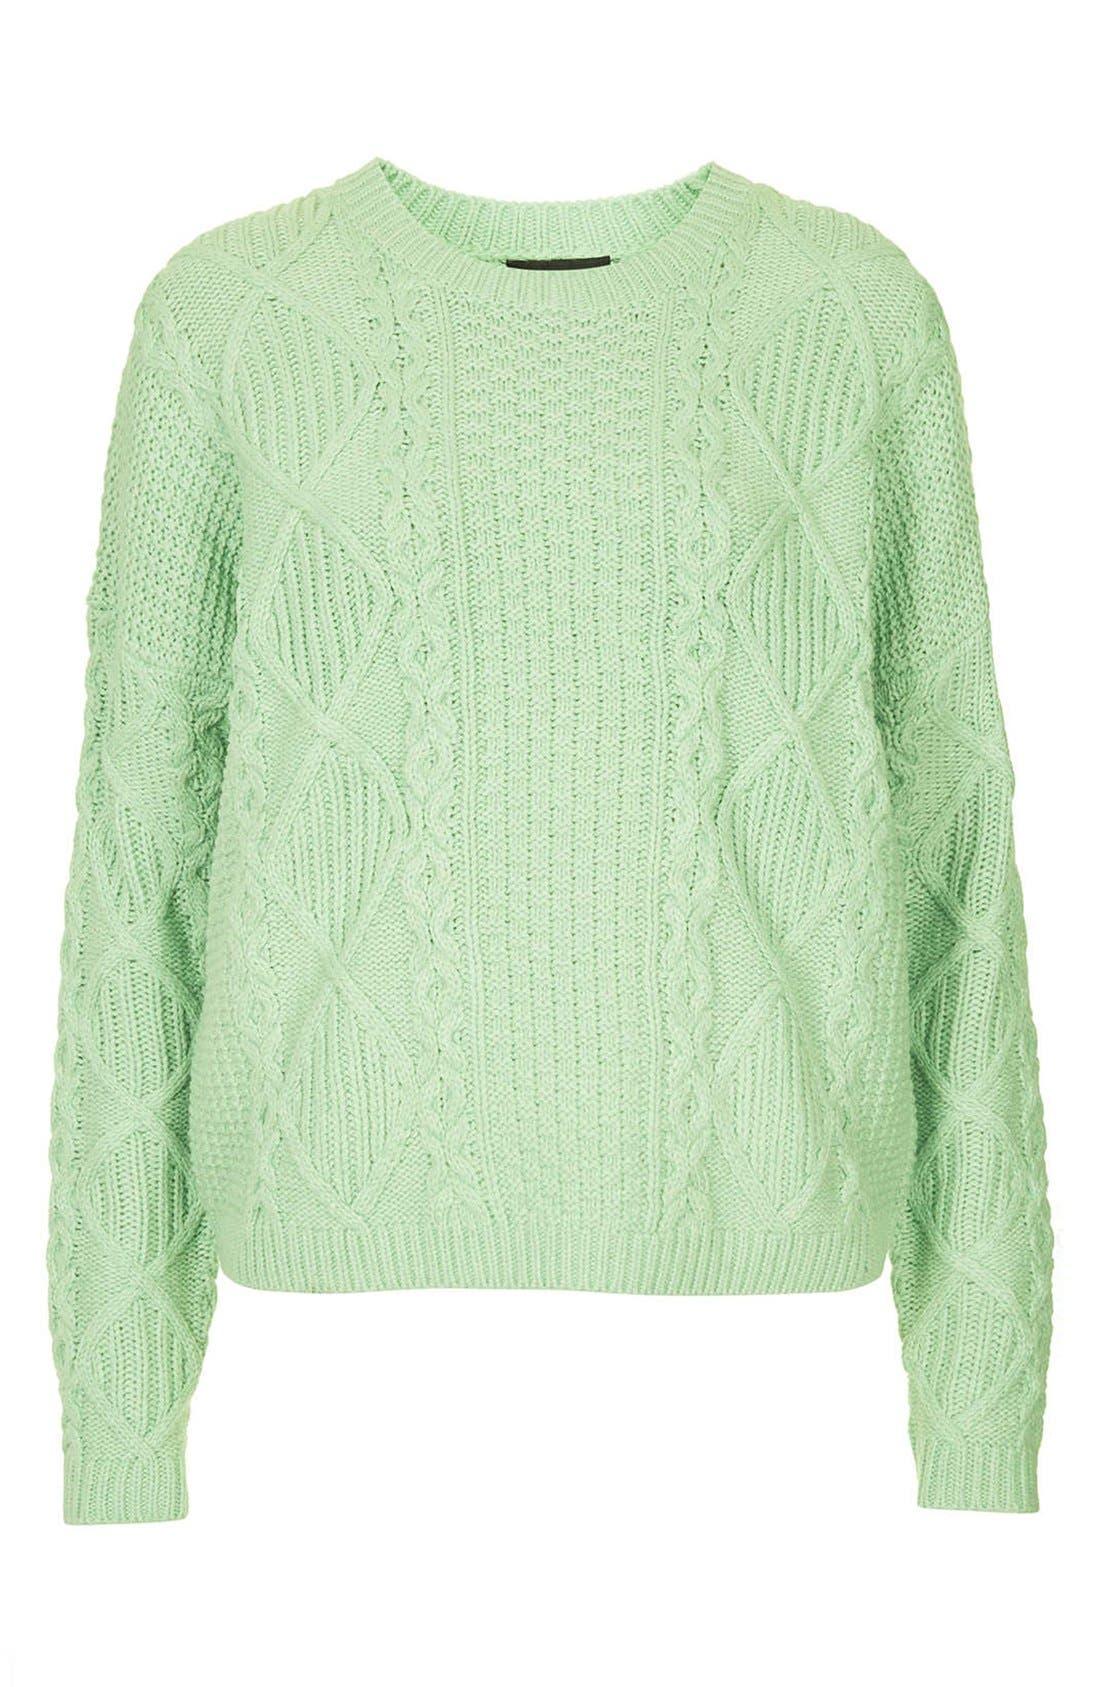 TOPSHOP, Crewneck Cable Knit Sweater, Alternate thumbnail 5, color, 340